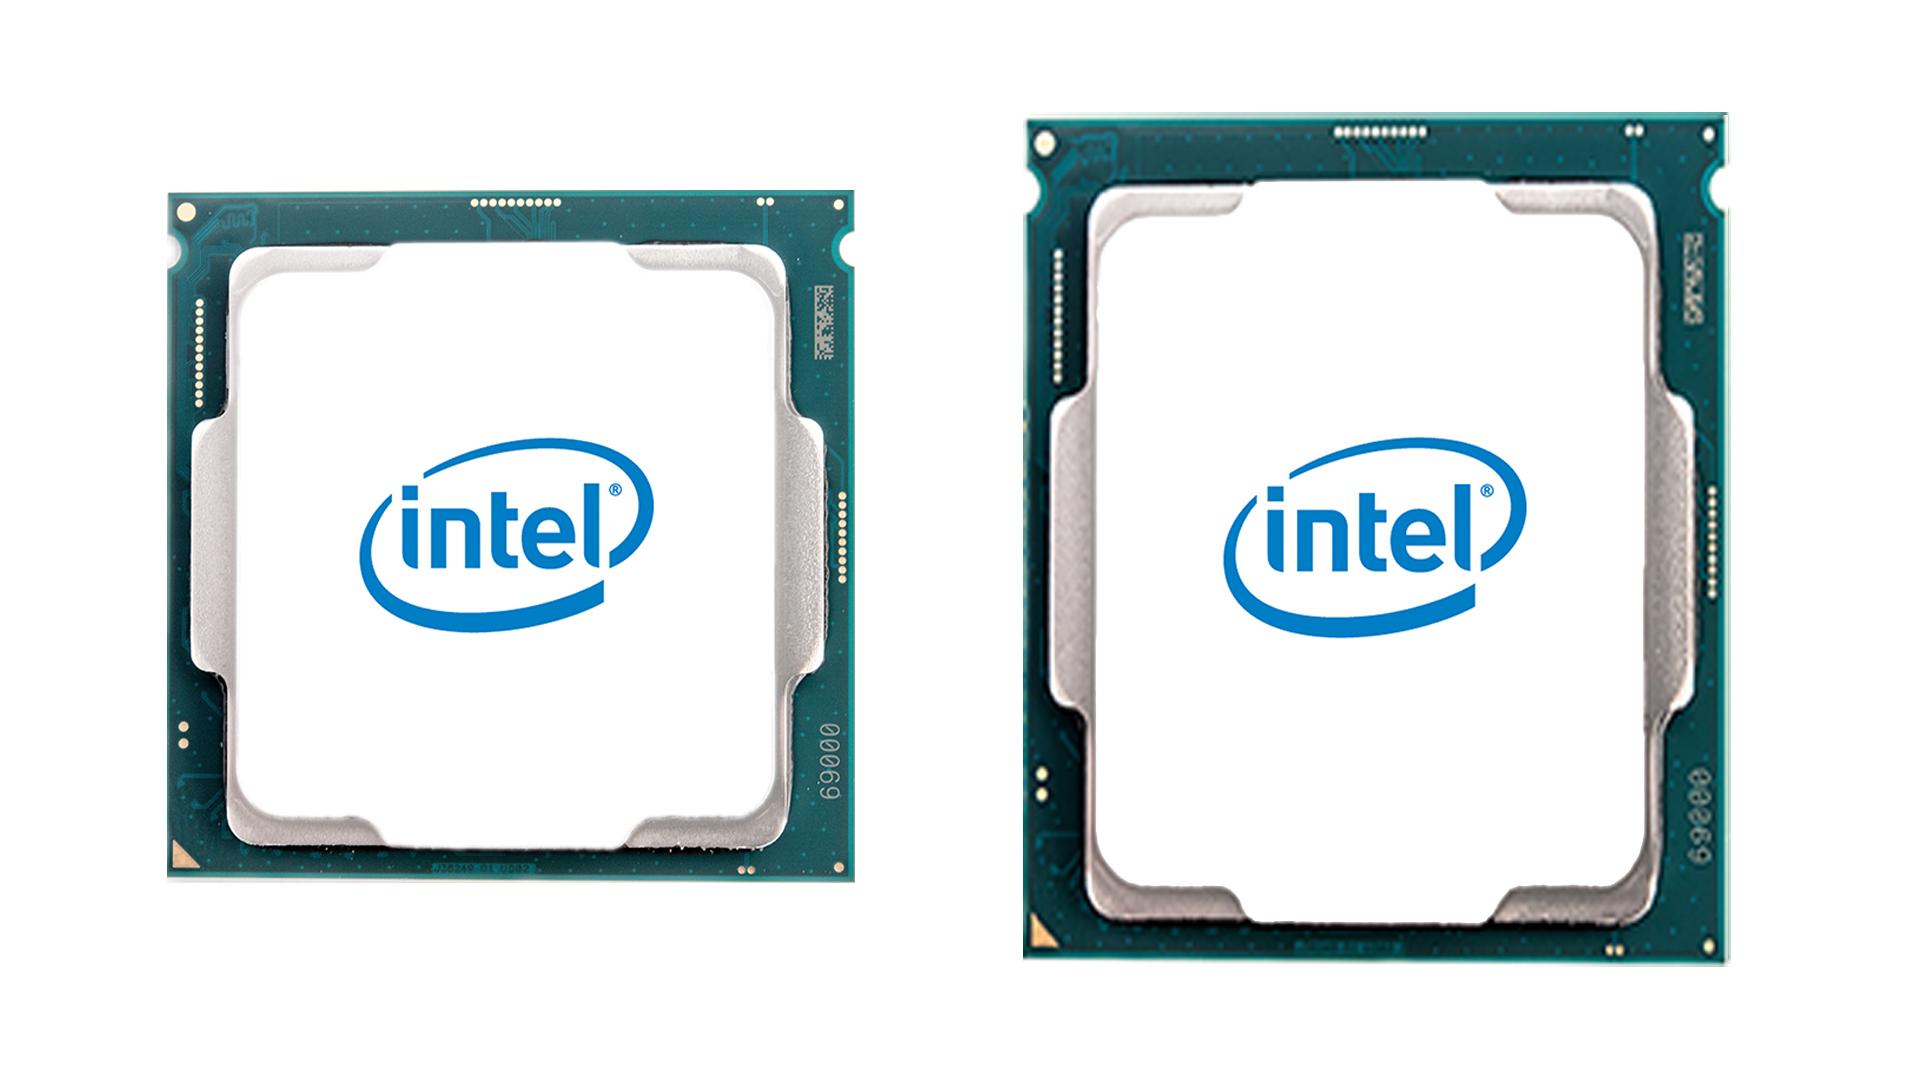 Intel's Alder Lake flagship i9 12900K could beat the AMD Ryzen 9 5950X